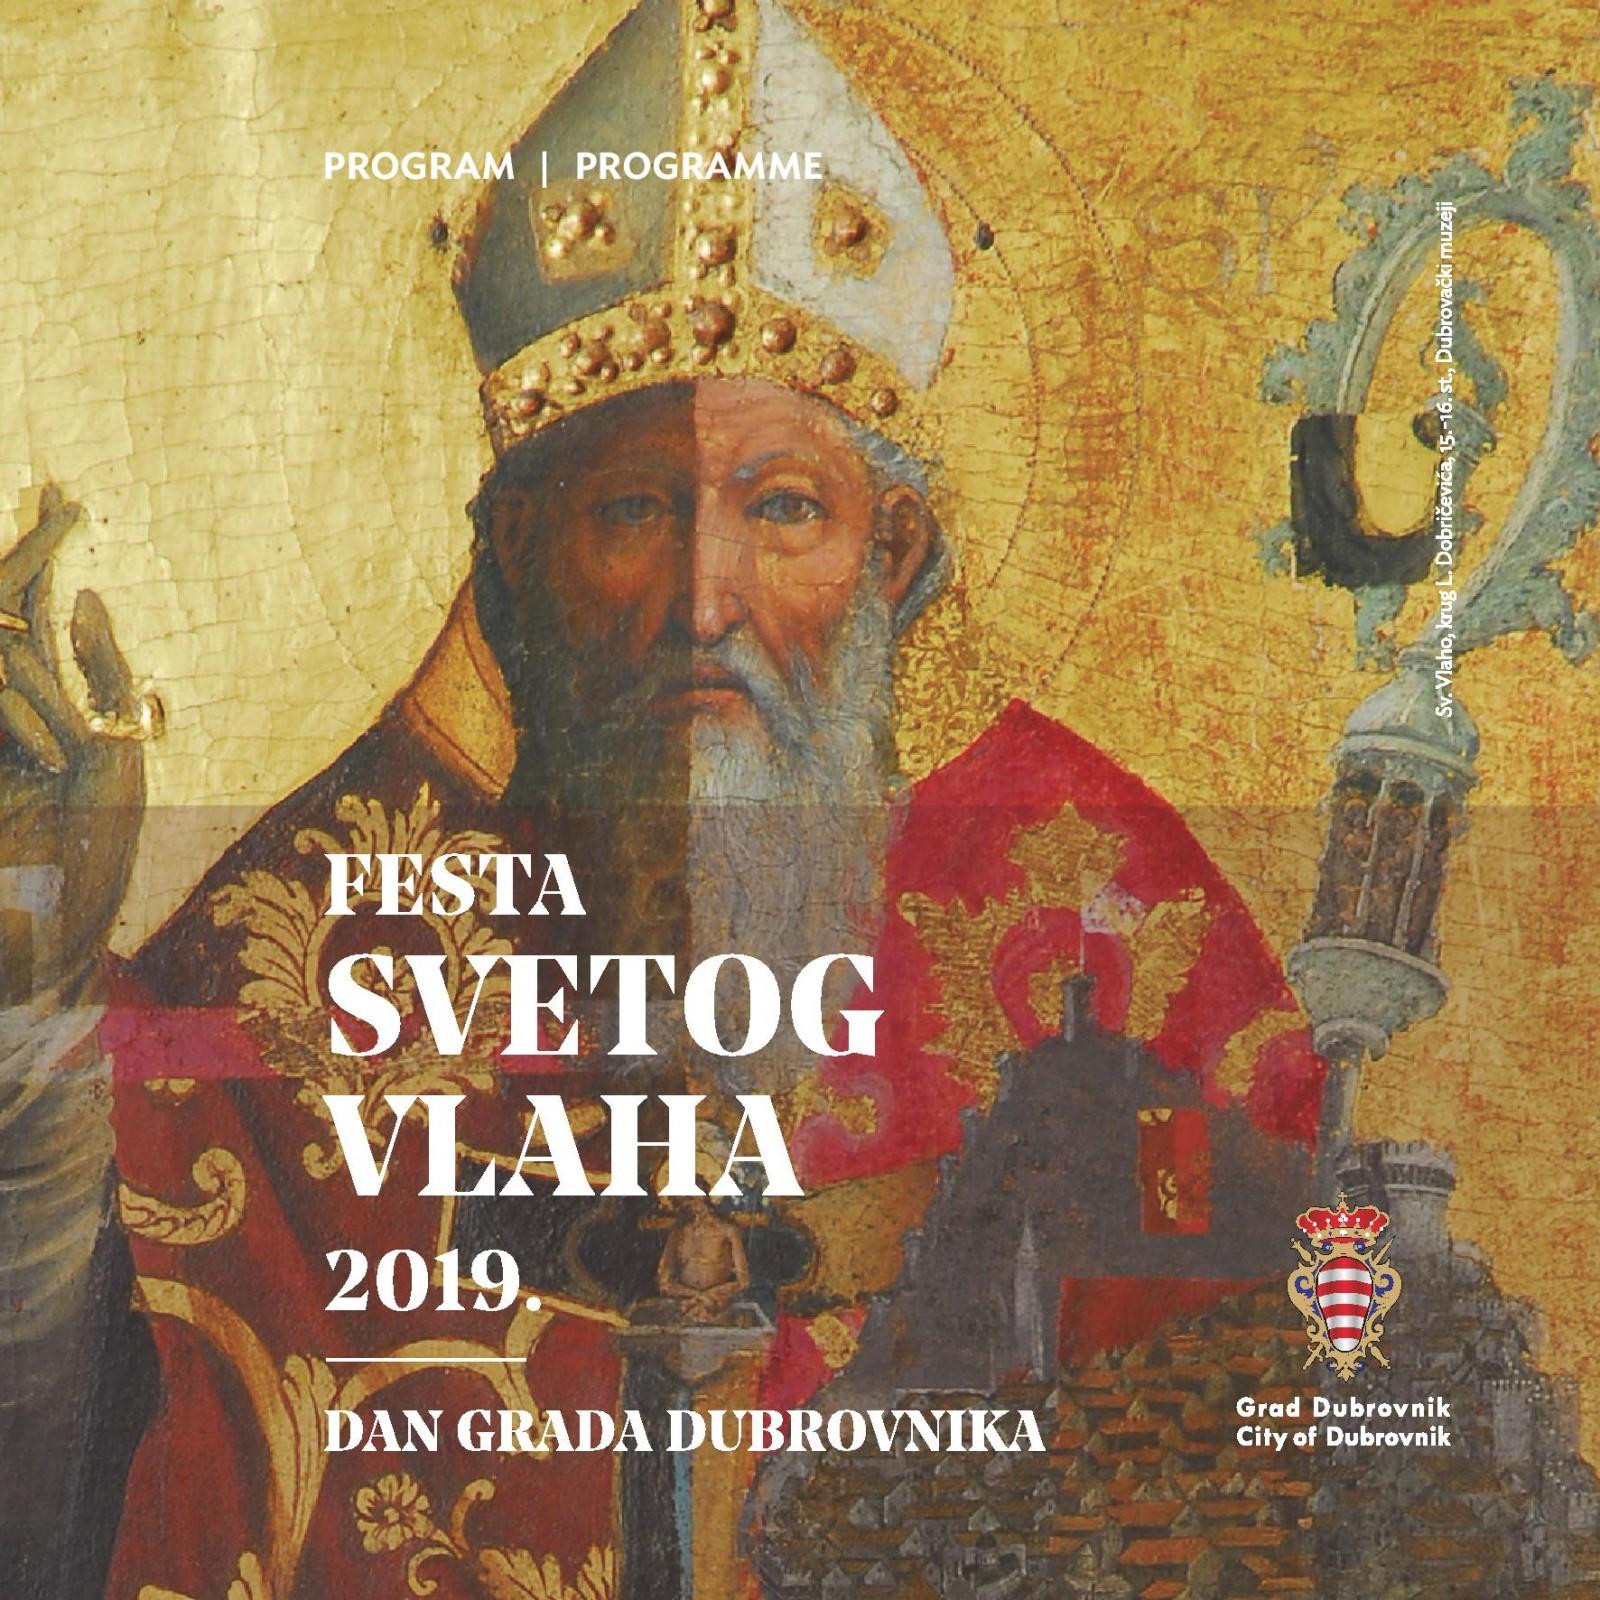 FESTA SVETOG VLAHA I DAN GRADA DUBROVNIKA 2019.